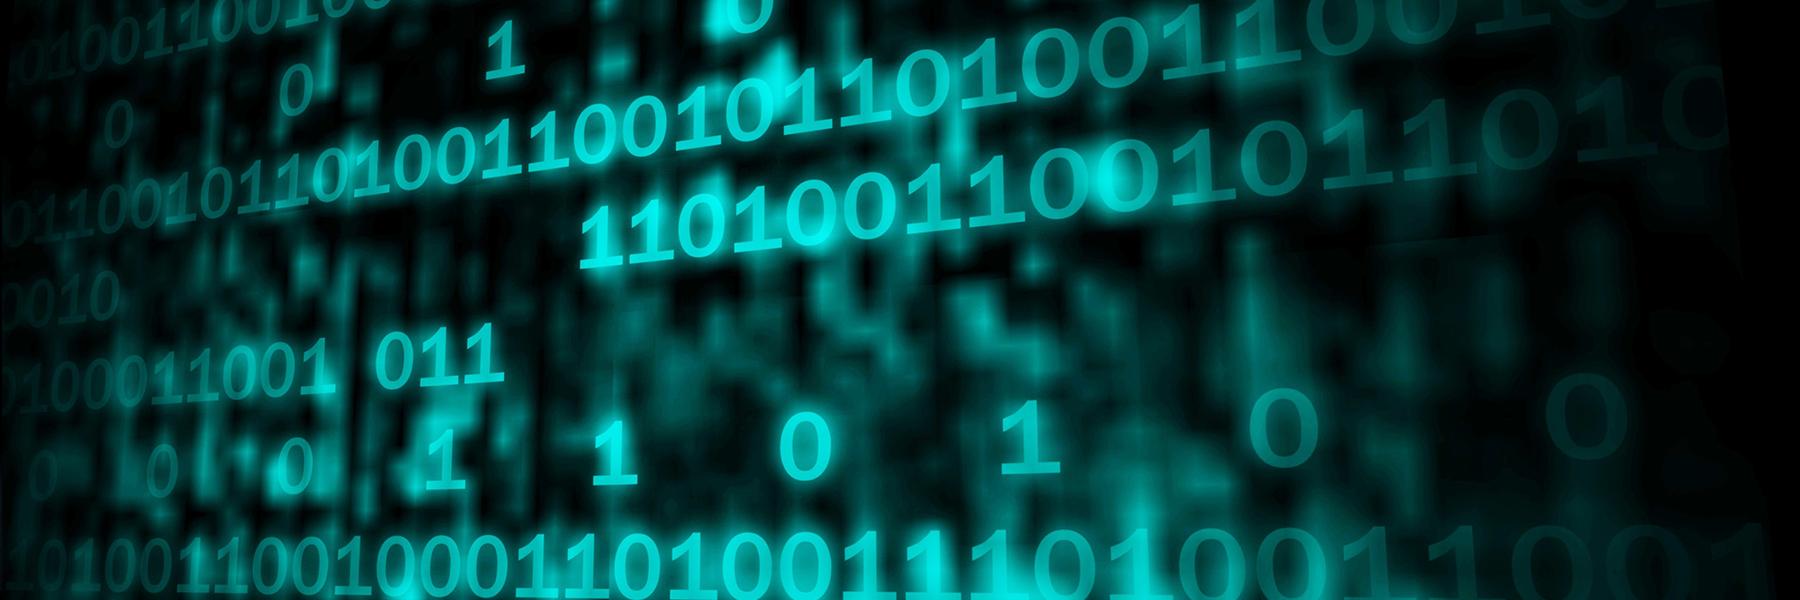 computer matrix data code